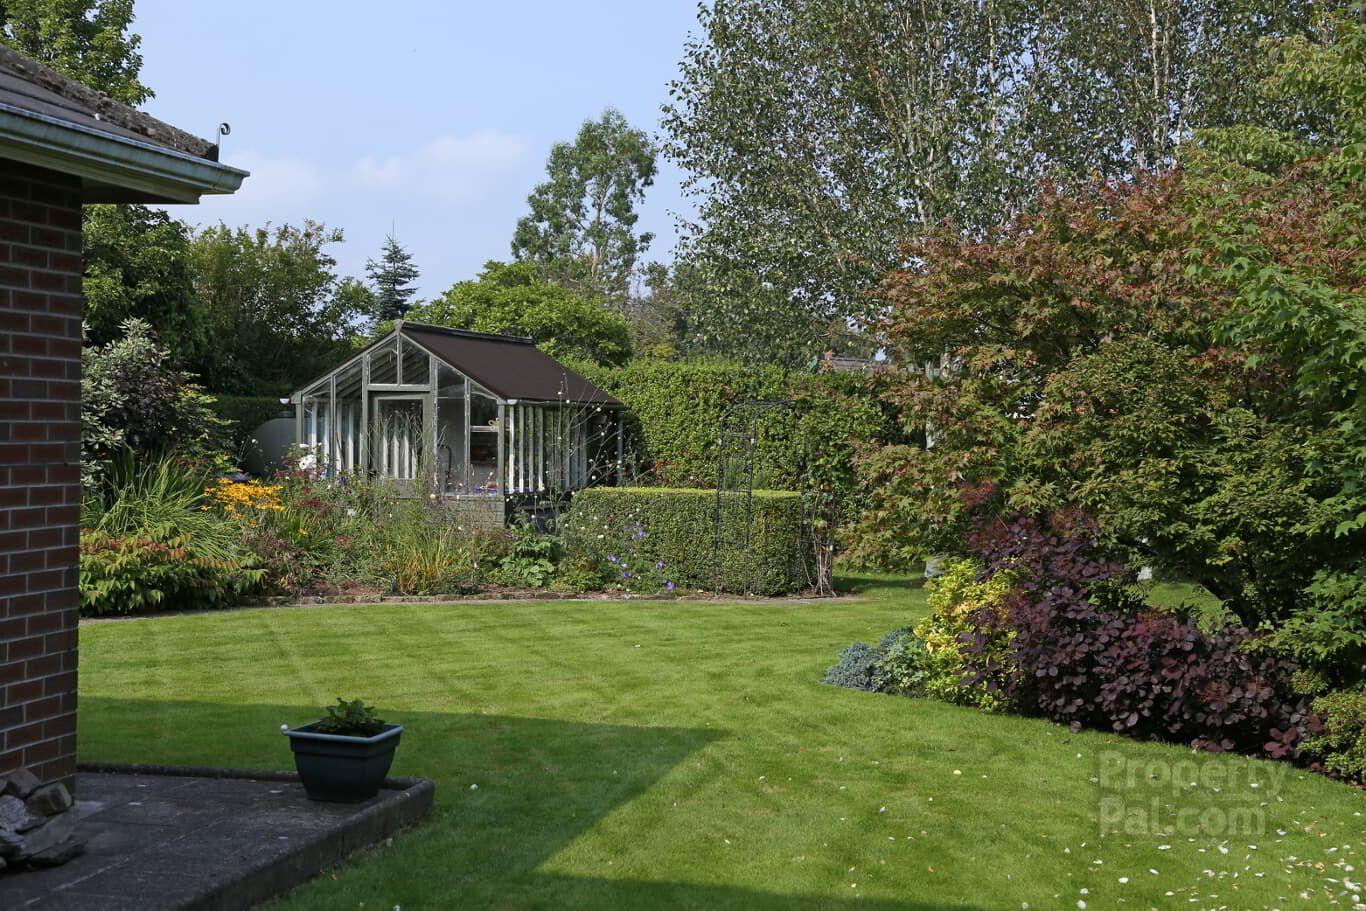 7 Norwood Park, Belfast #garden | Norwood park, Small ...